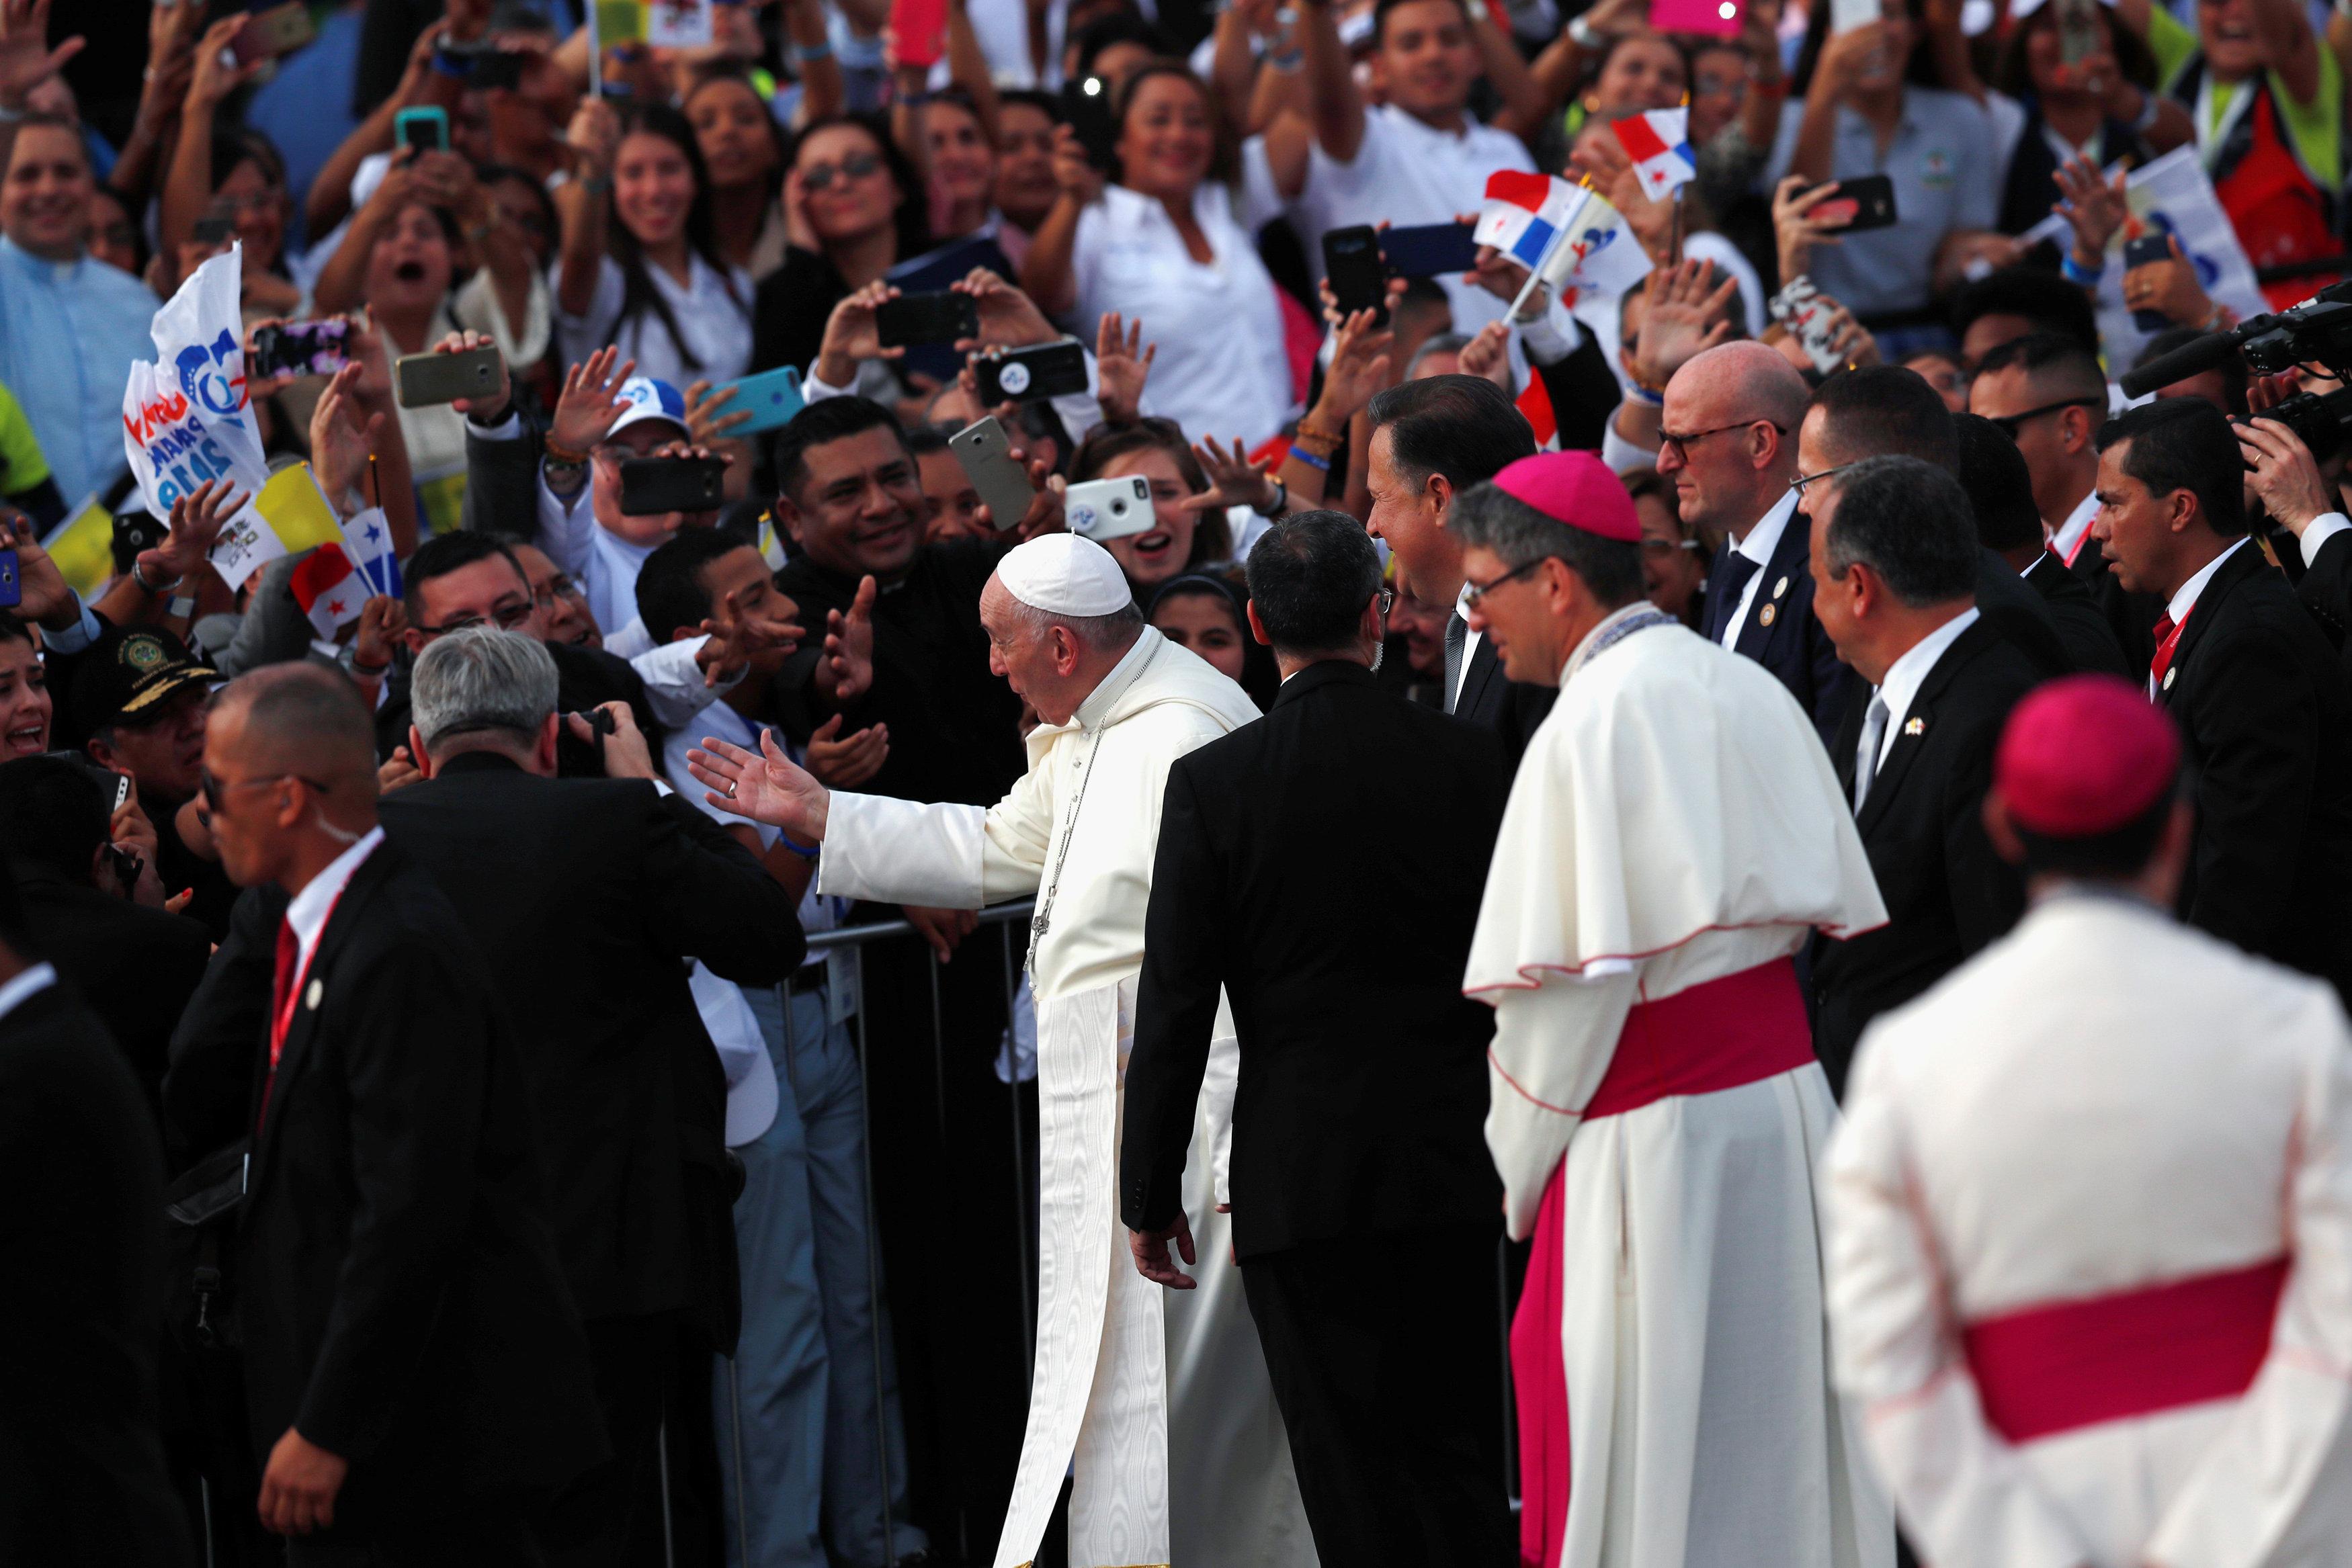 استقبال حاشد لبابا الفاتيكان لدى وصوله بنما  (1)